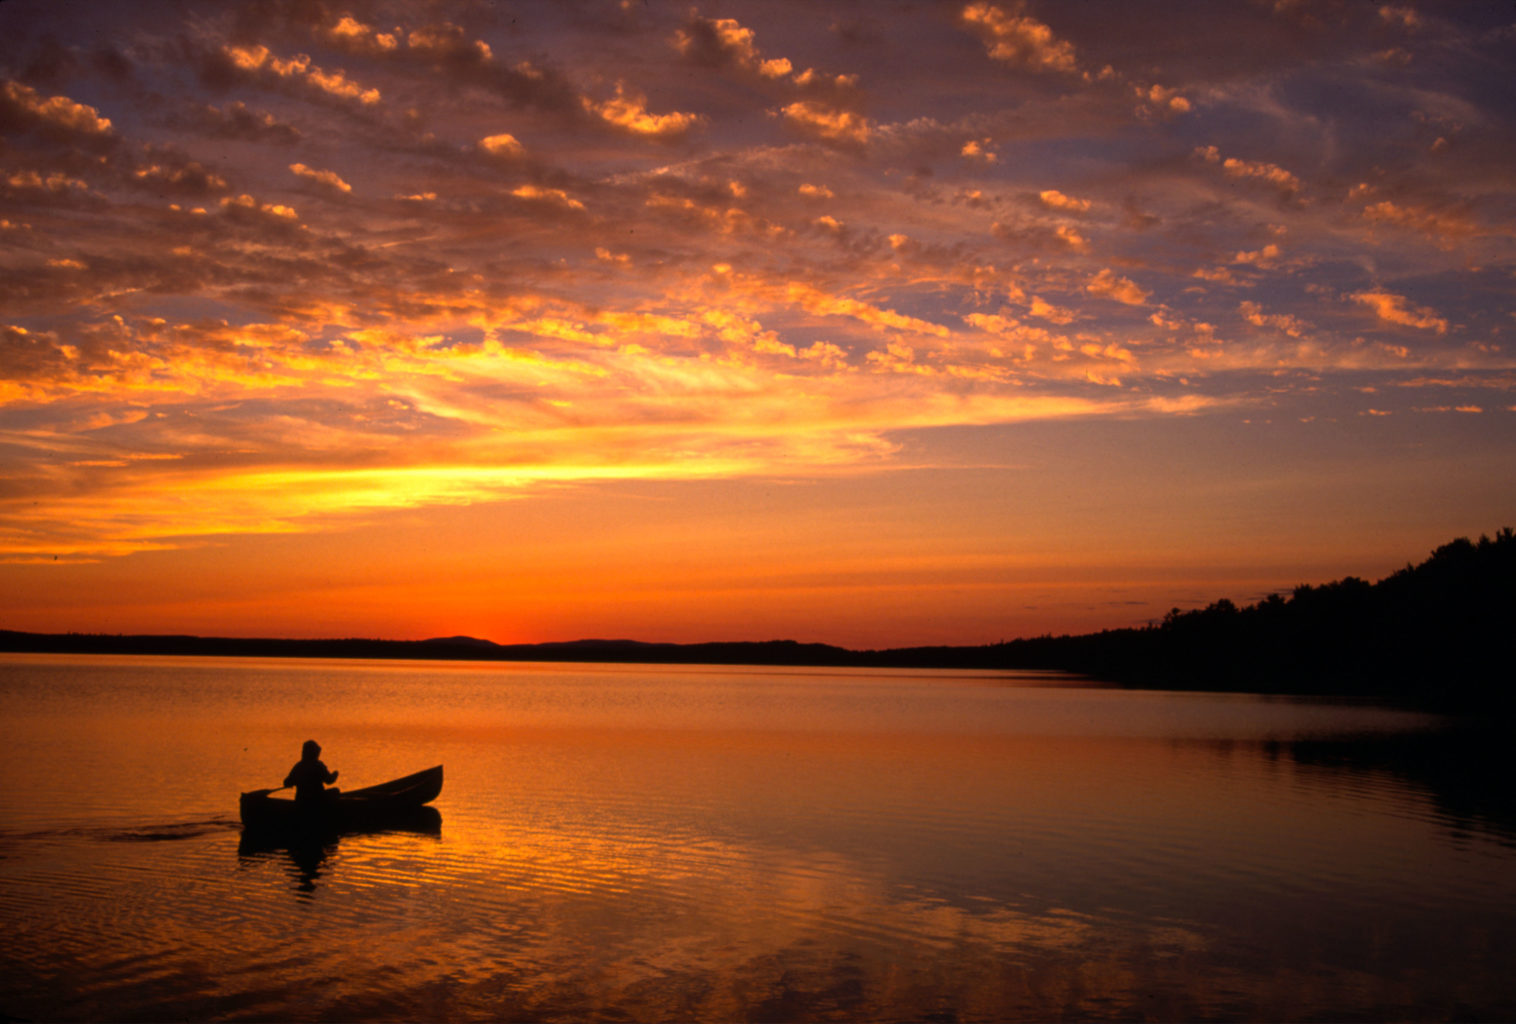 Chesuncook sunset Gero Island by Jym St. Pierre